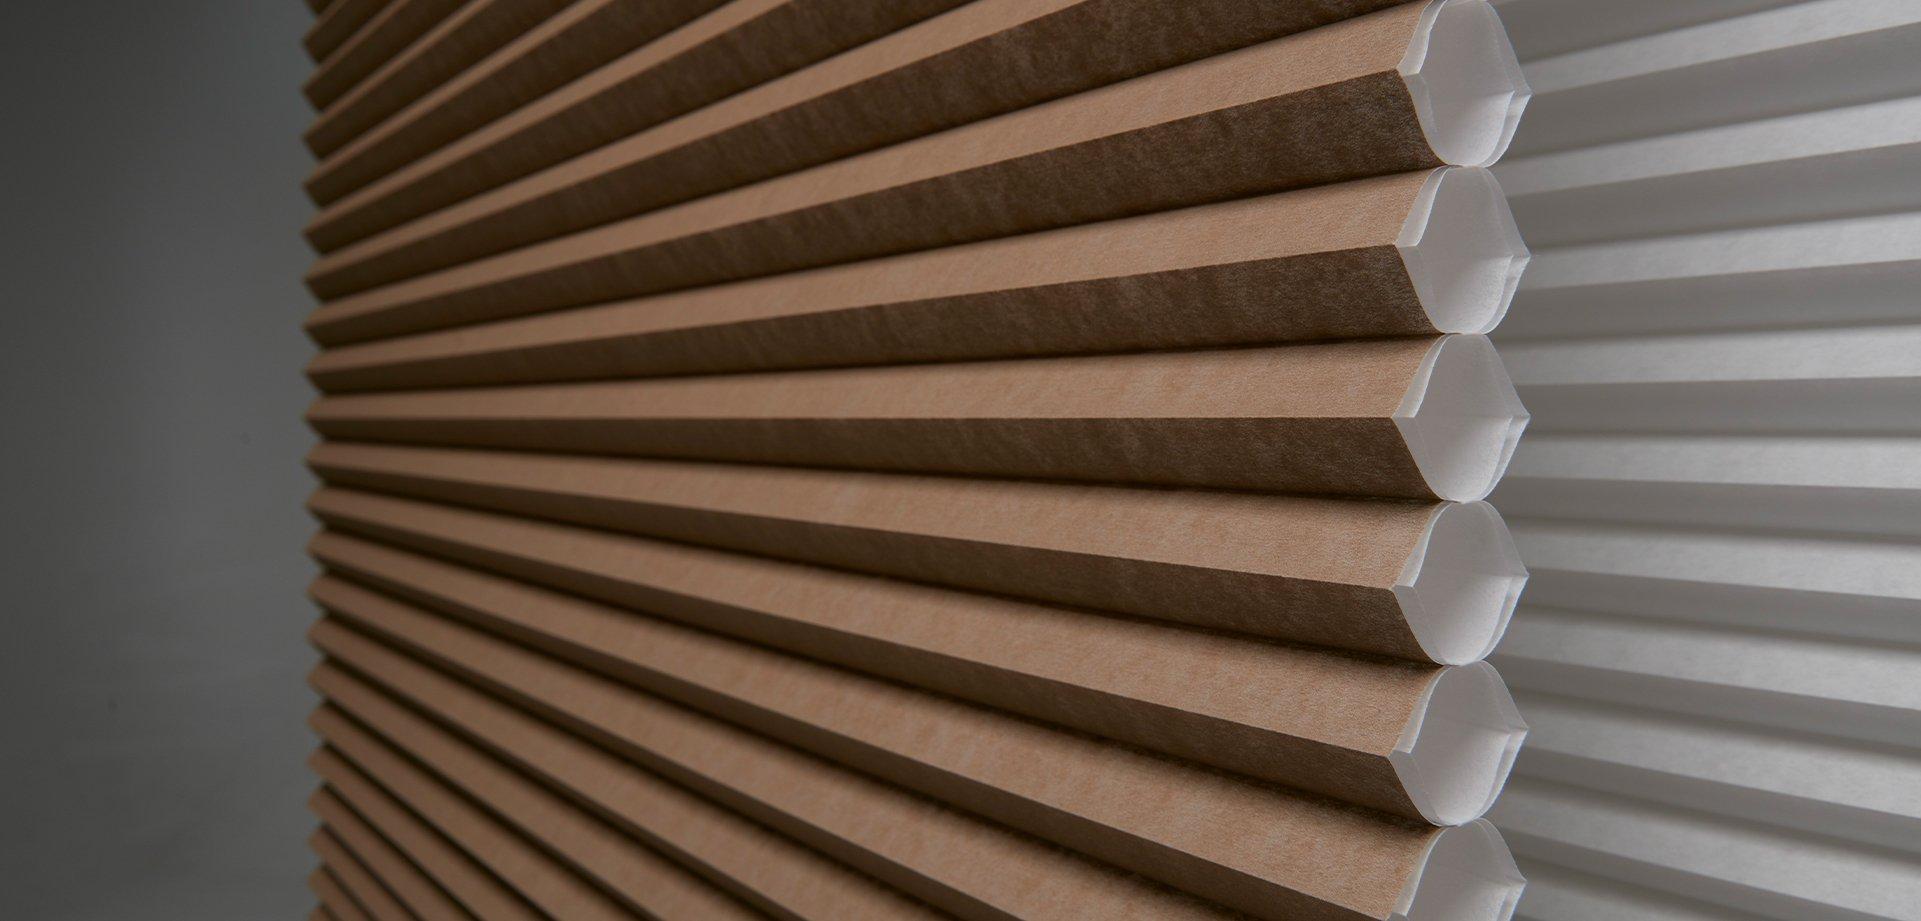 Whisper Architella Shades image showcasing honeycomb structure and insulating air pockets